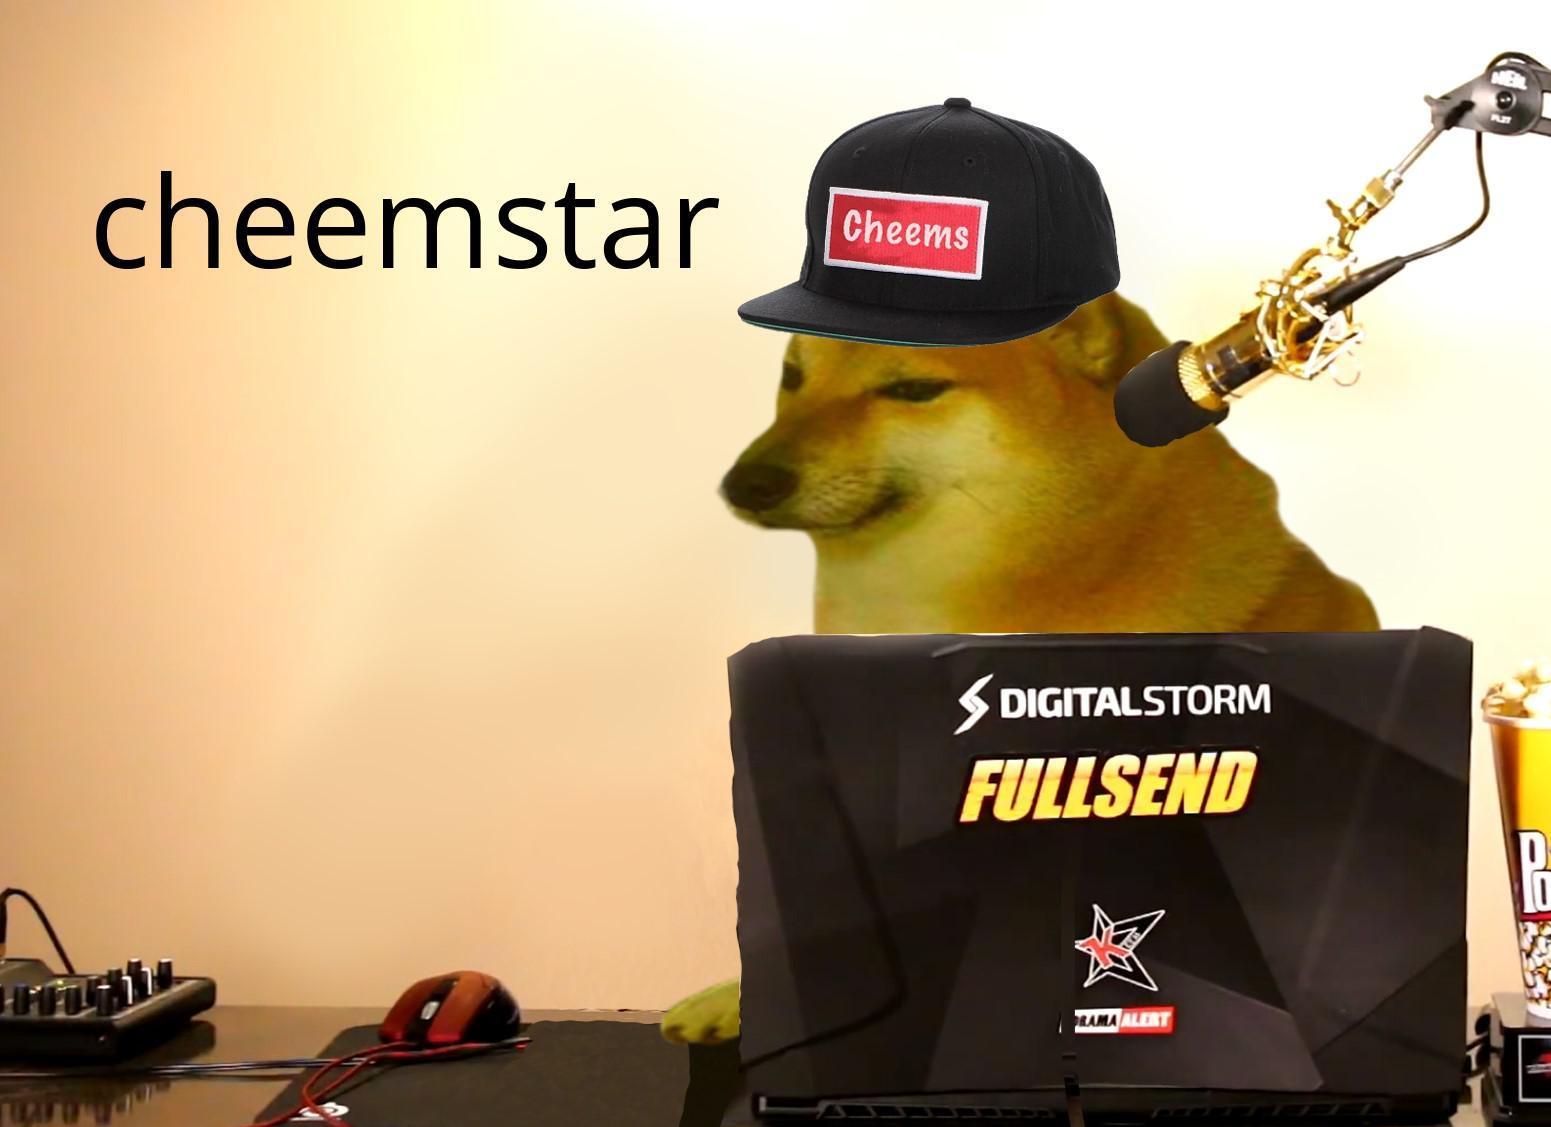 Cheemstar - meme